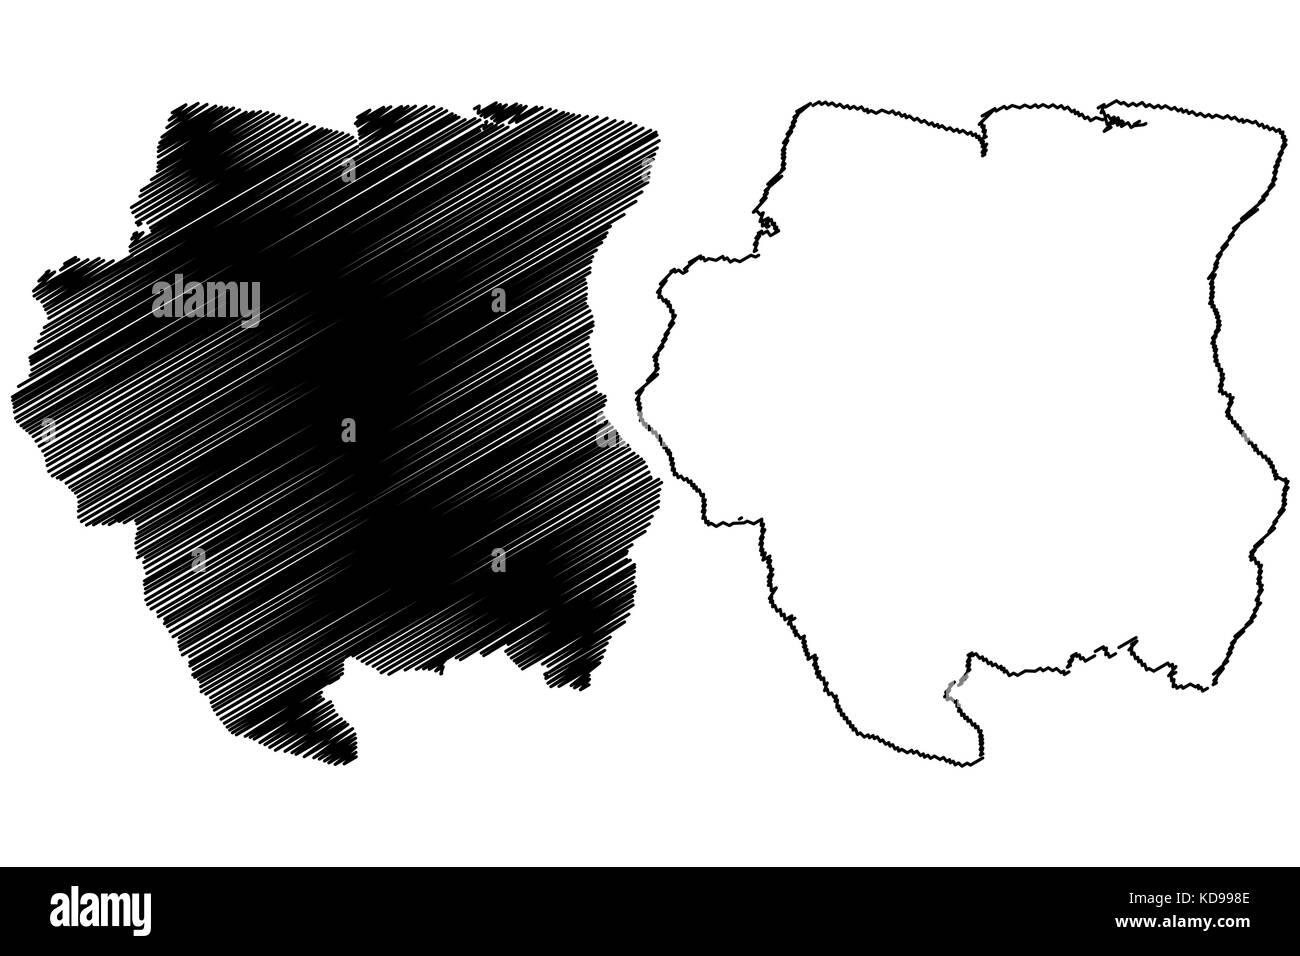 Suriname map vector illustration, scribble sketch Suriname - Stock Image